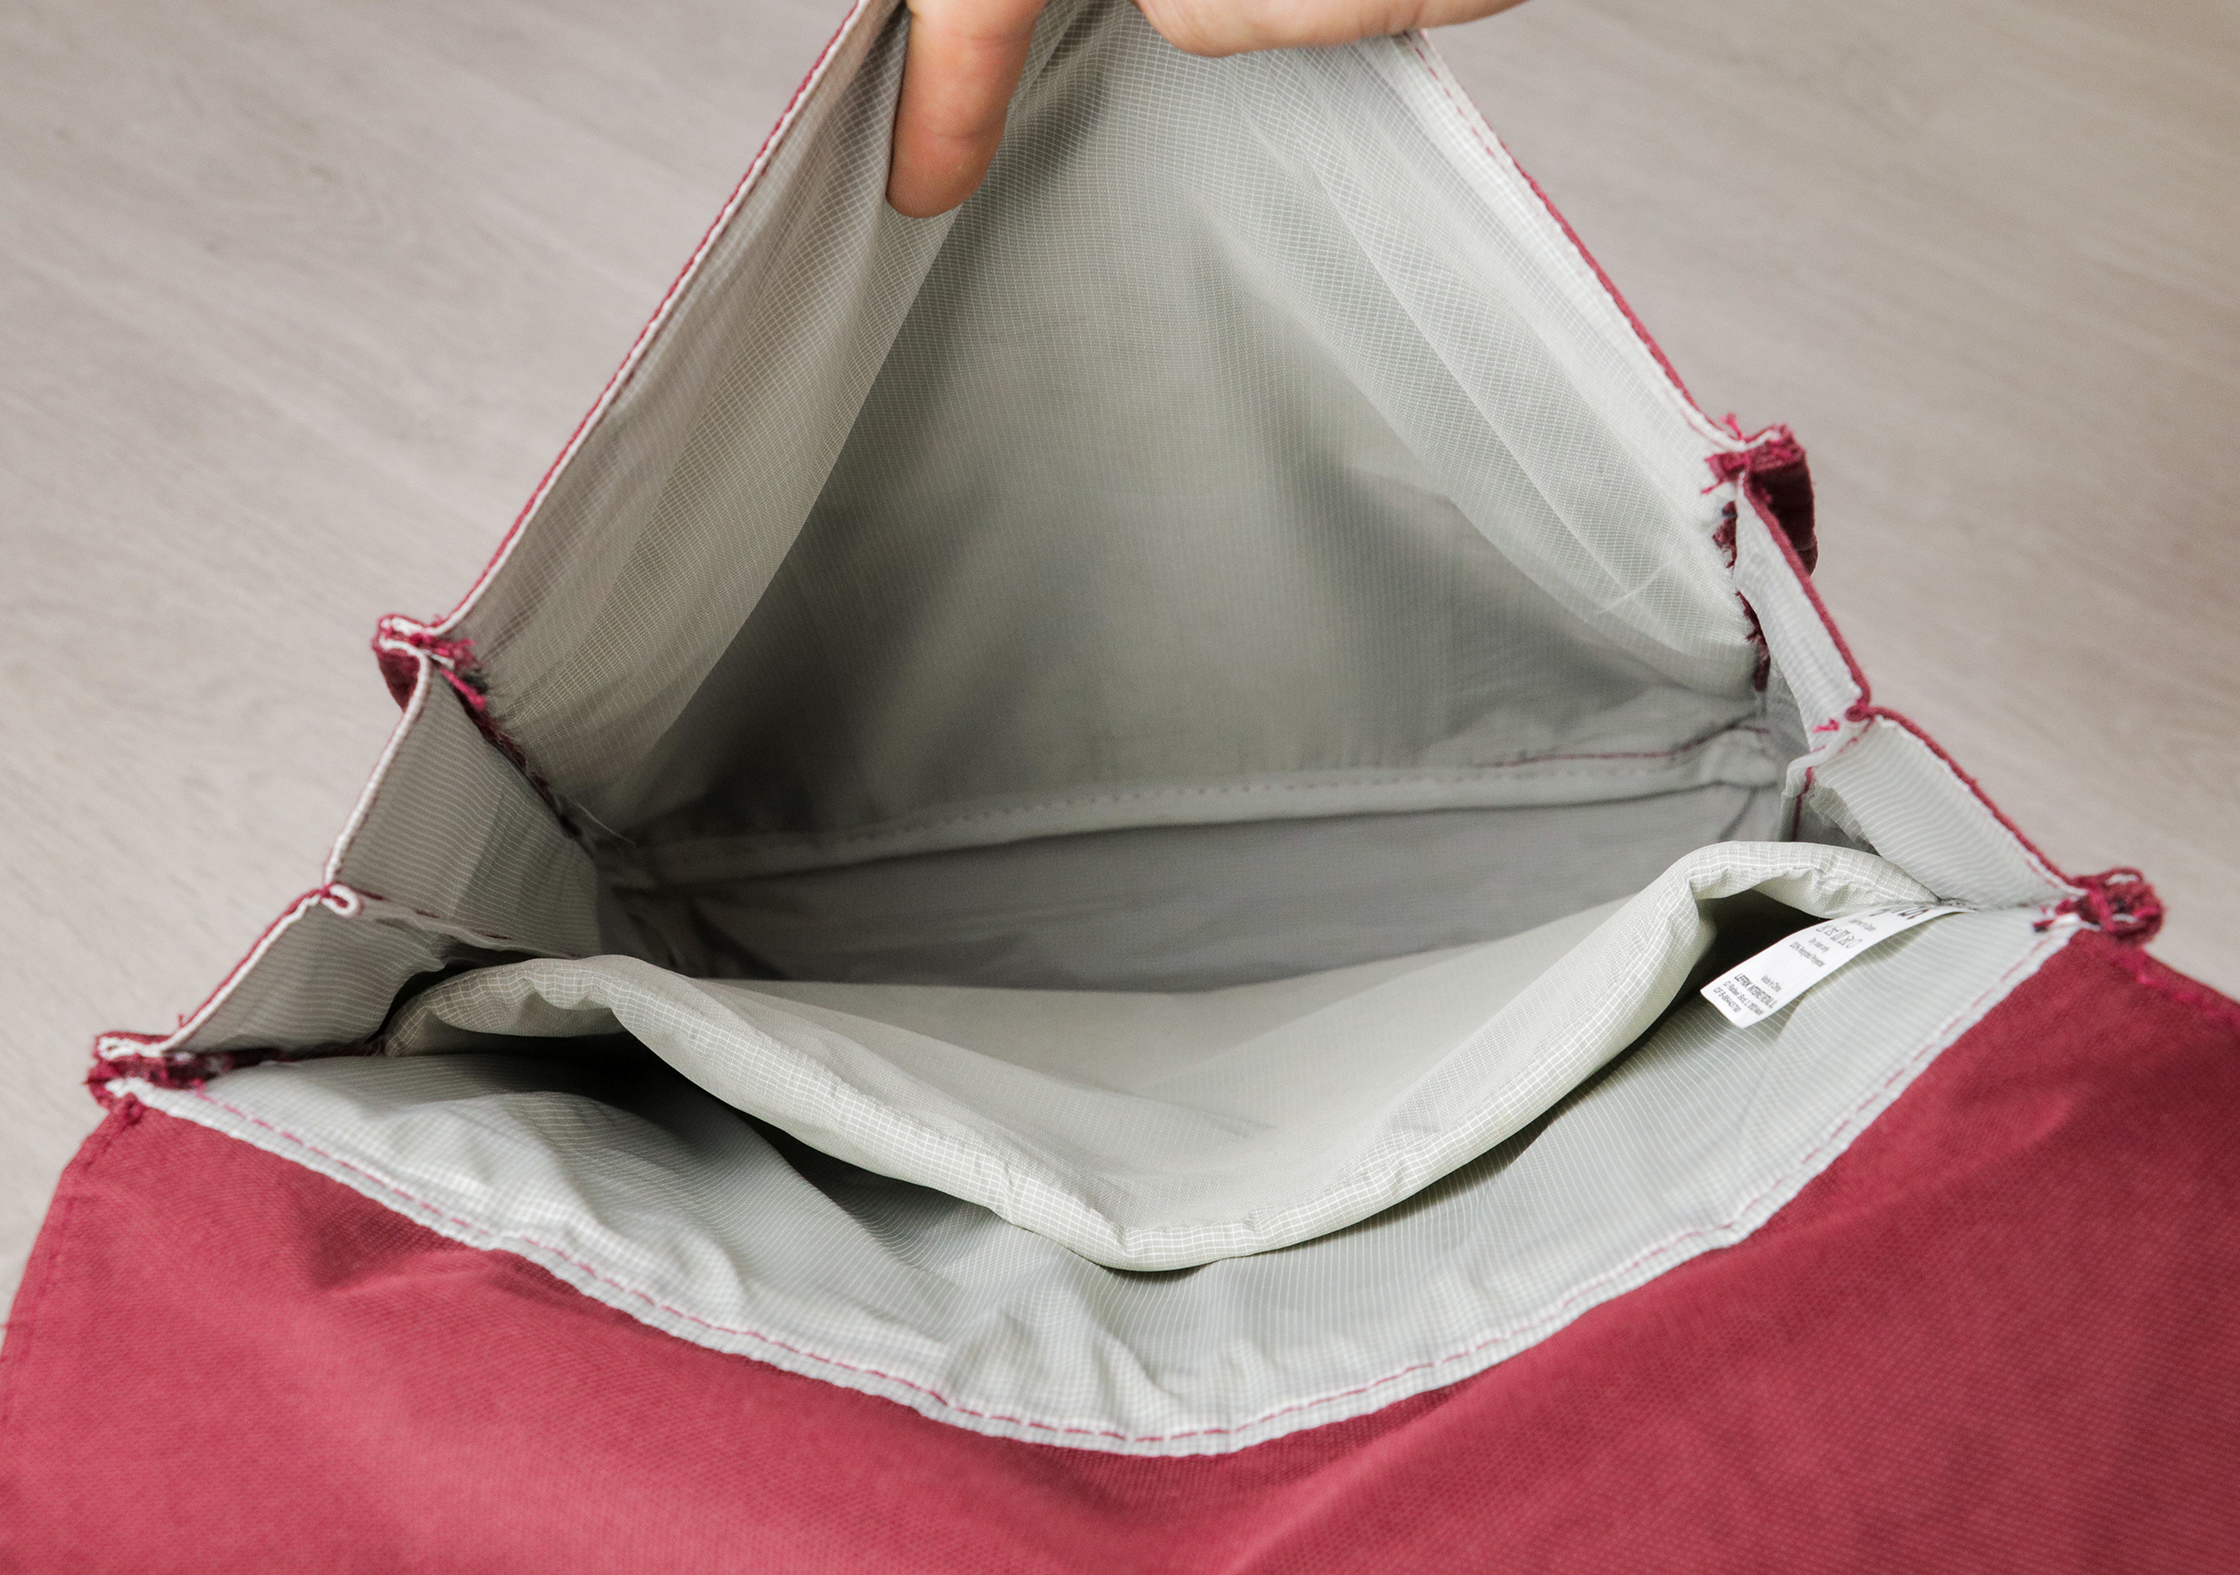 Lefrik Handy Backpack Nylon Lining